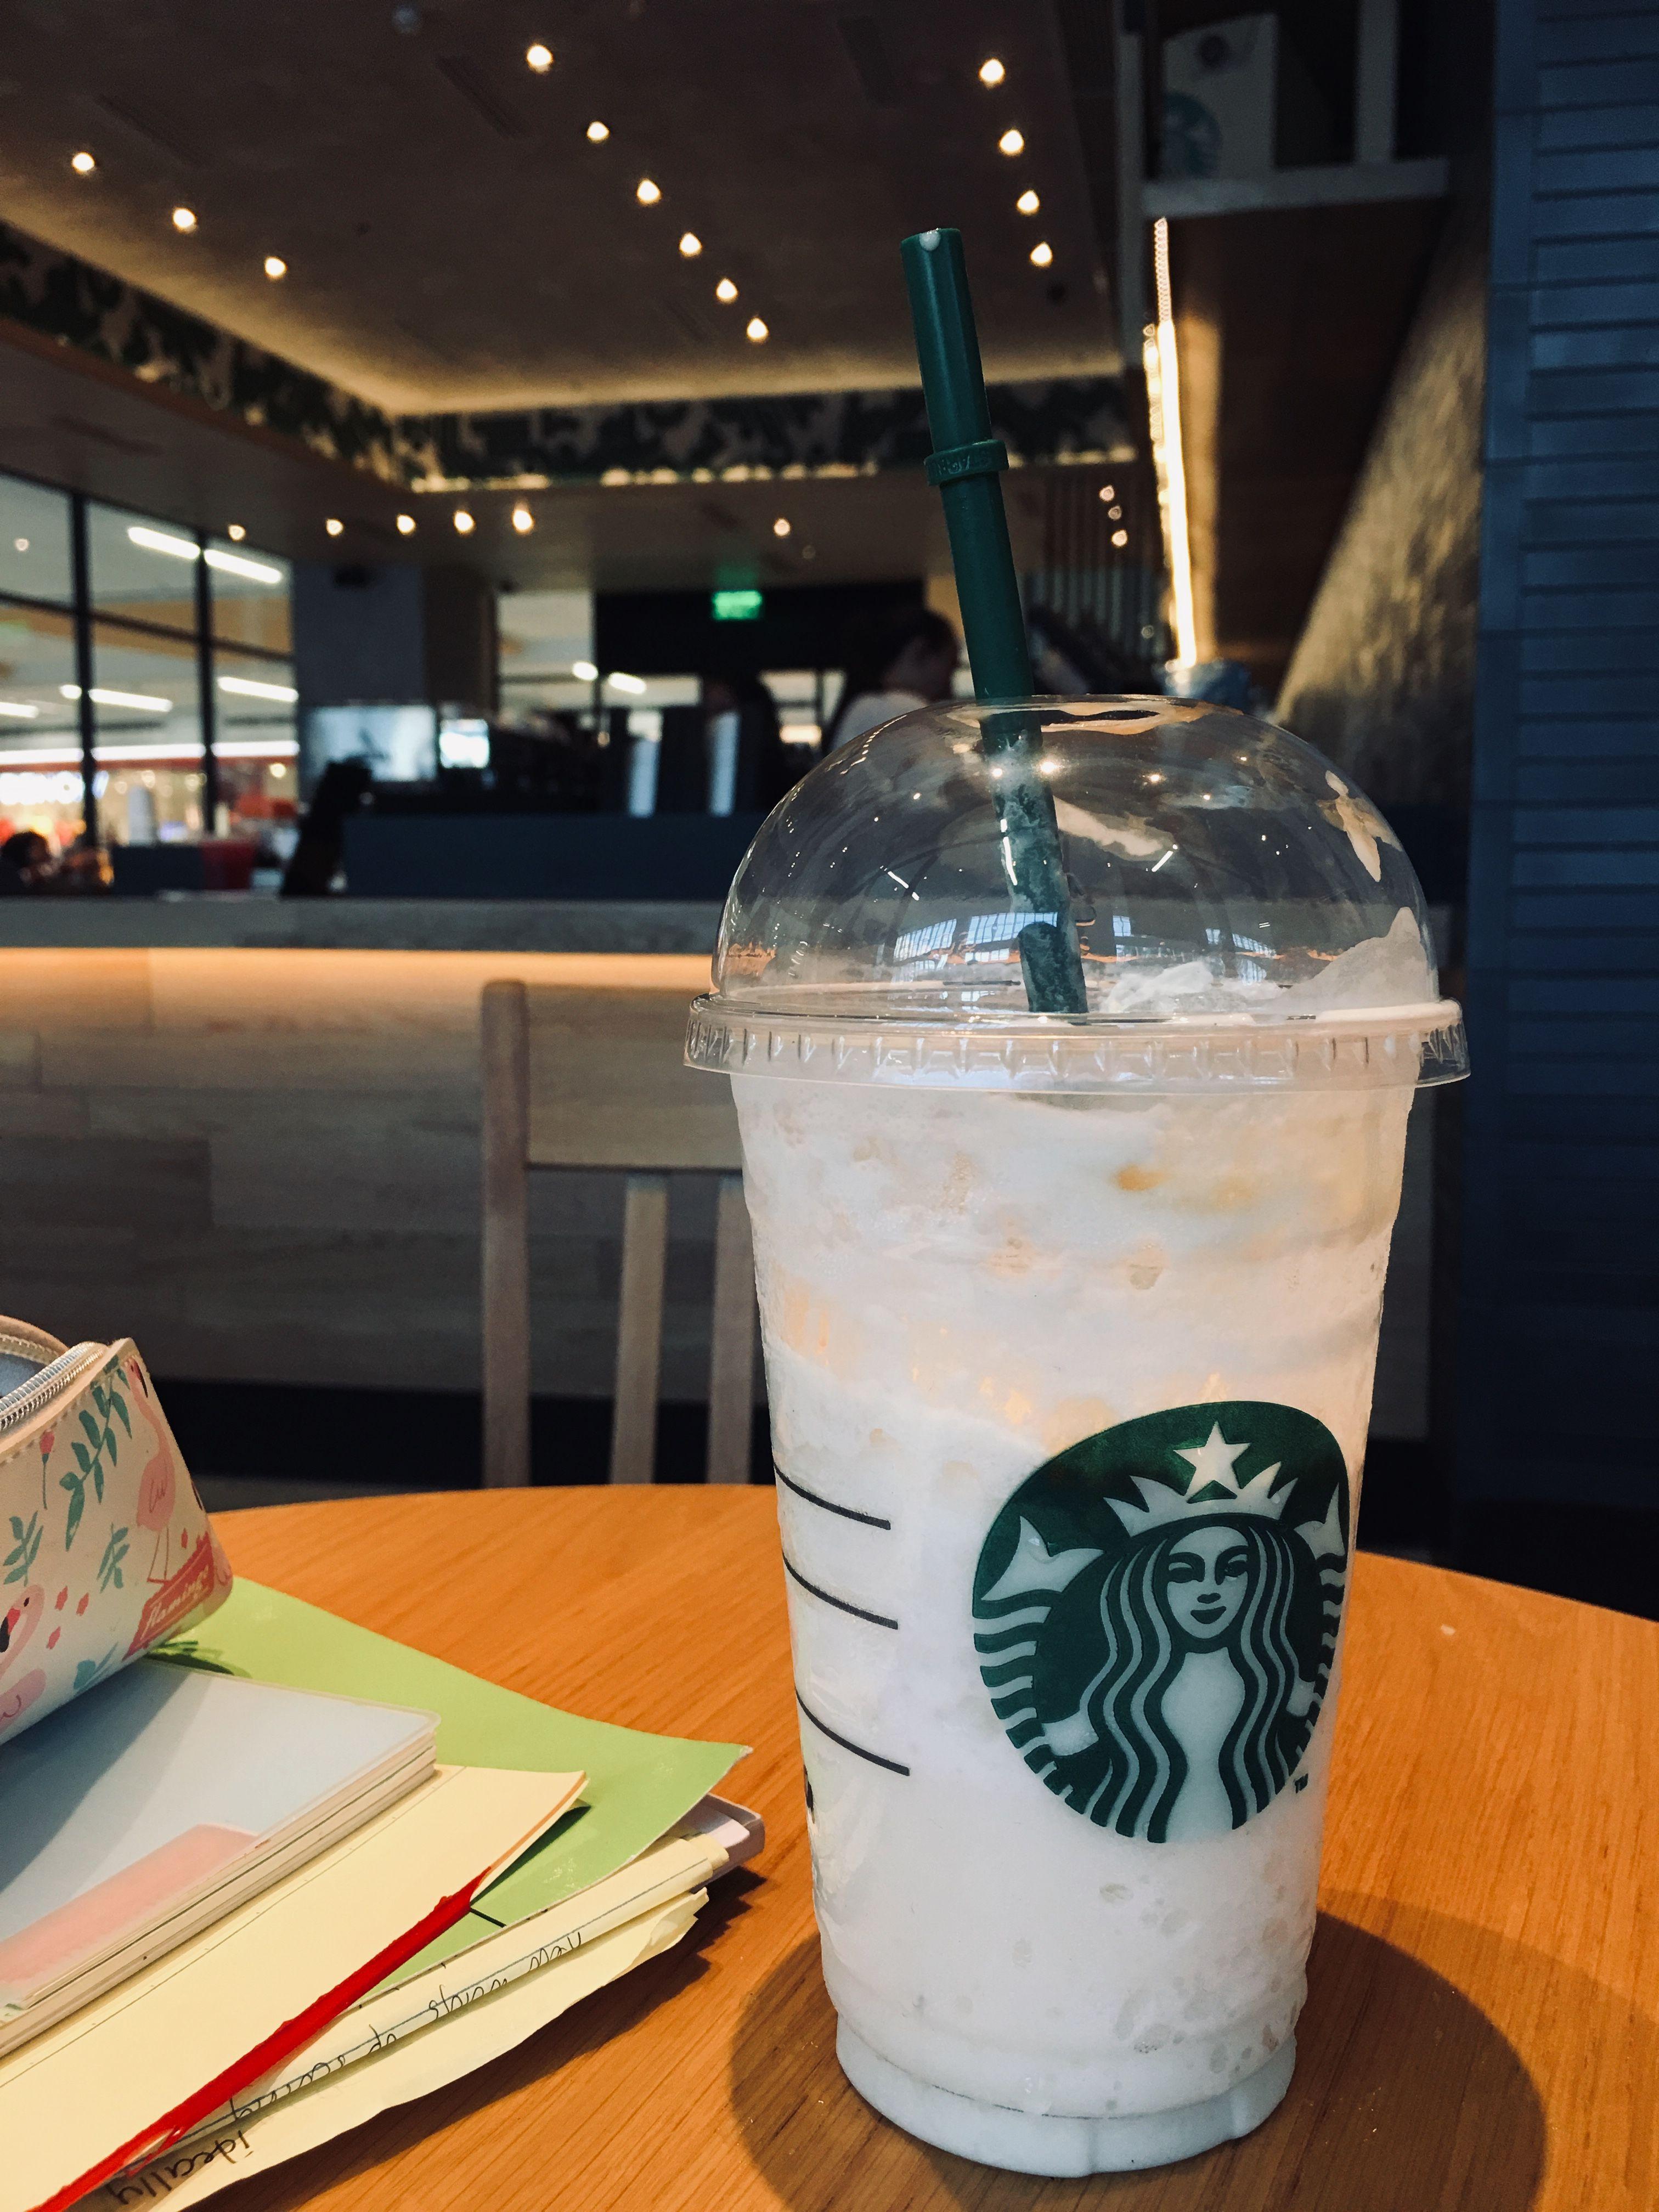 Starbucks Minuman, Makanan, Makanan dan minuman